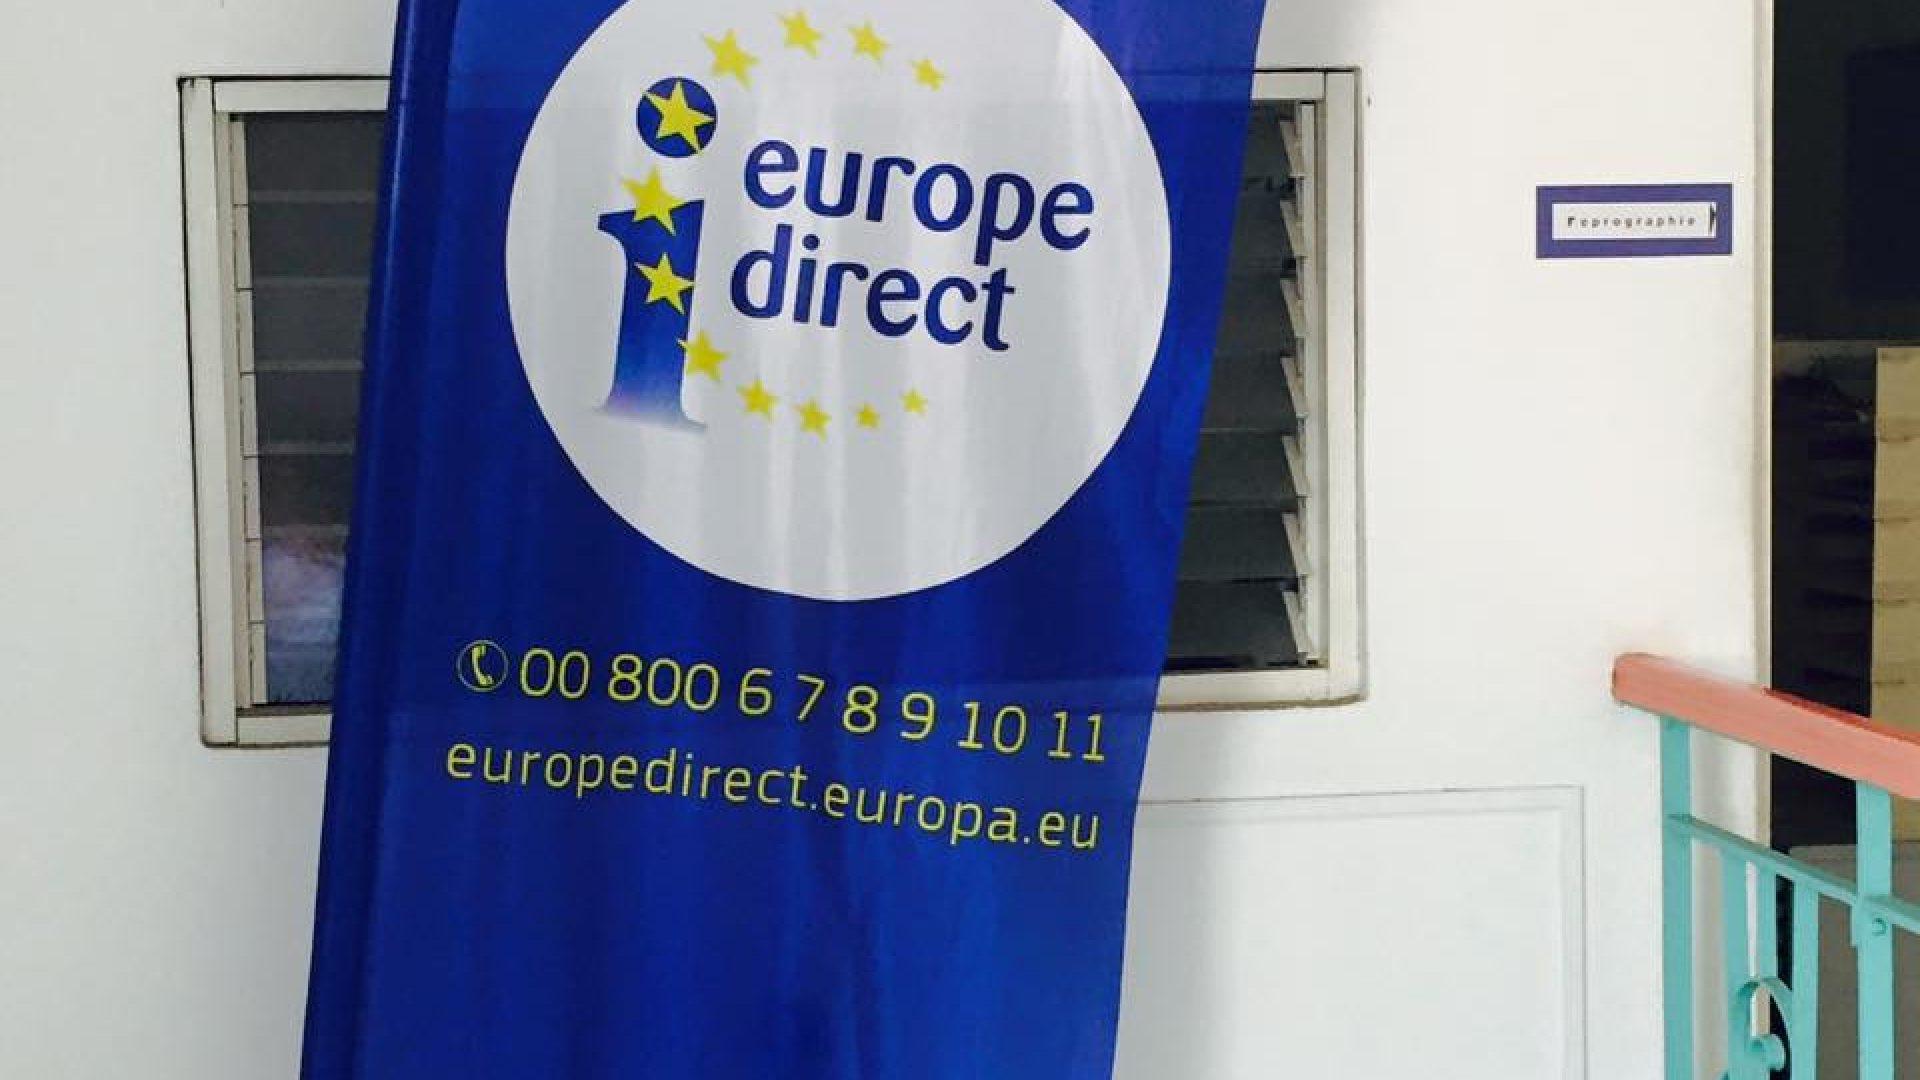 Europe Direct 1